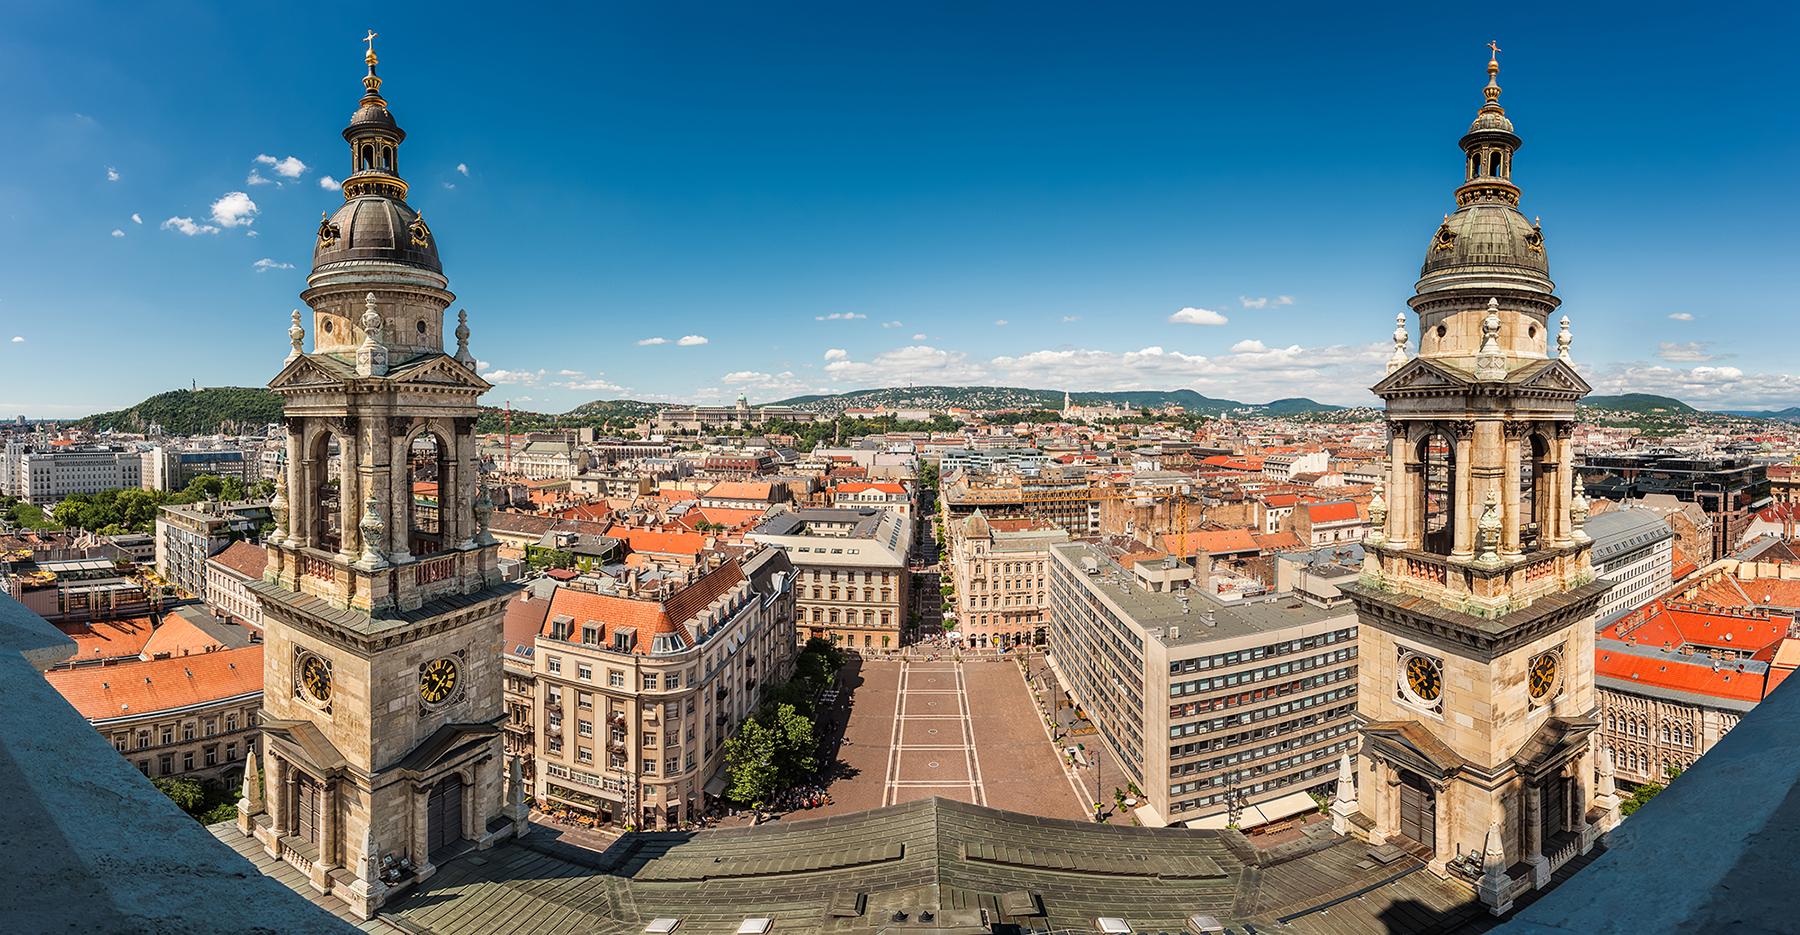 Panoramavy över centrala Budapest